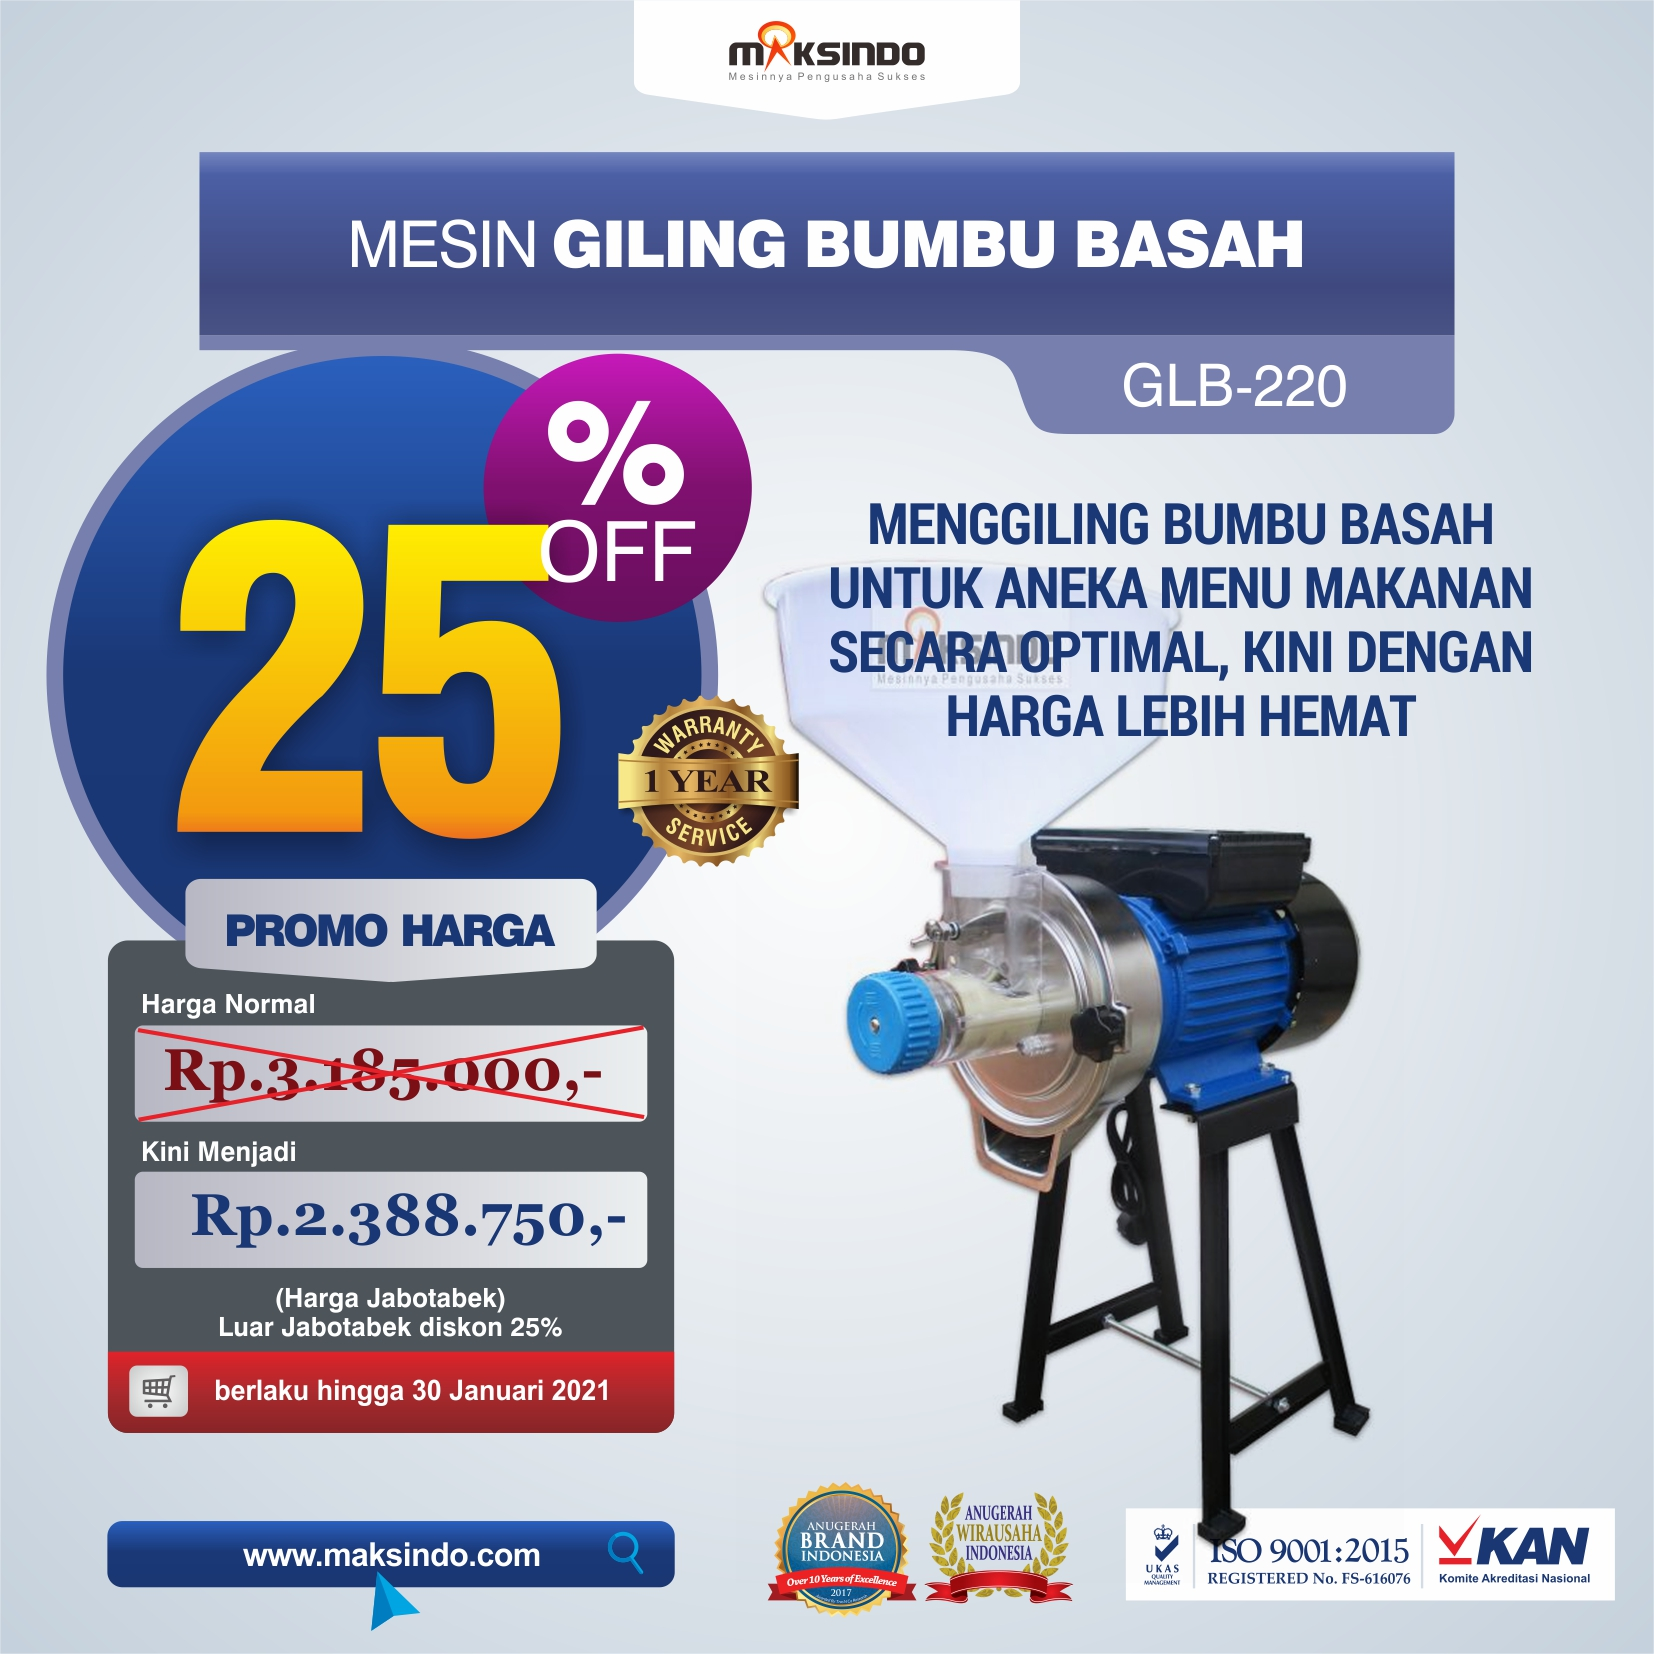 Jual Mesin Giling Bumbu Basah GLB220 di Tangerang